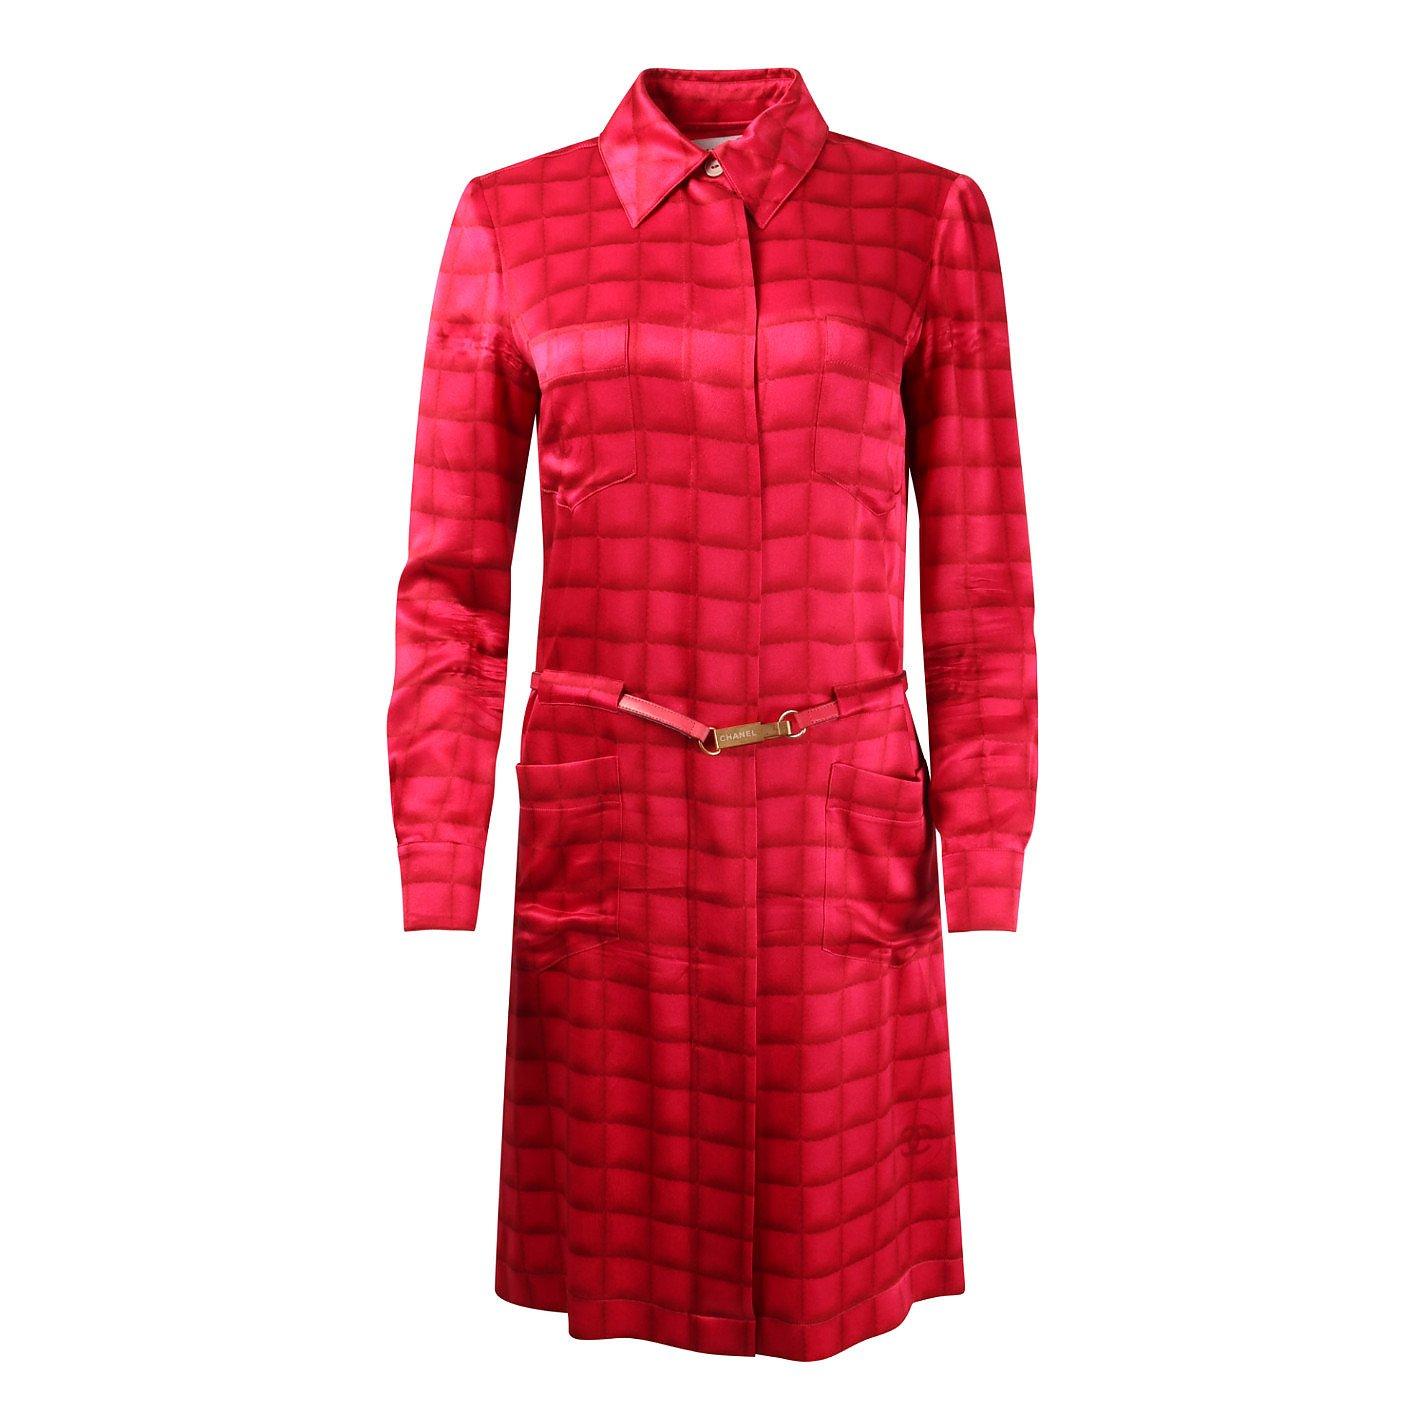 CHANEL Printed Silk Shirt Dress